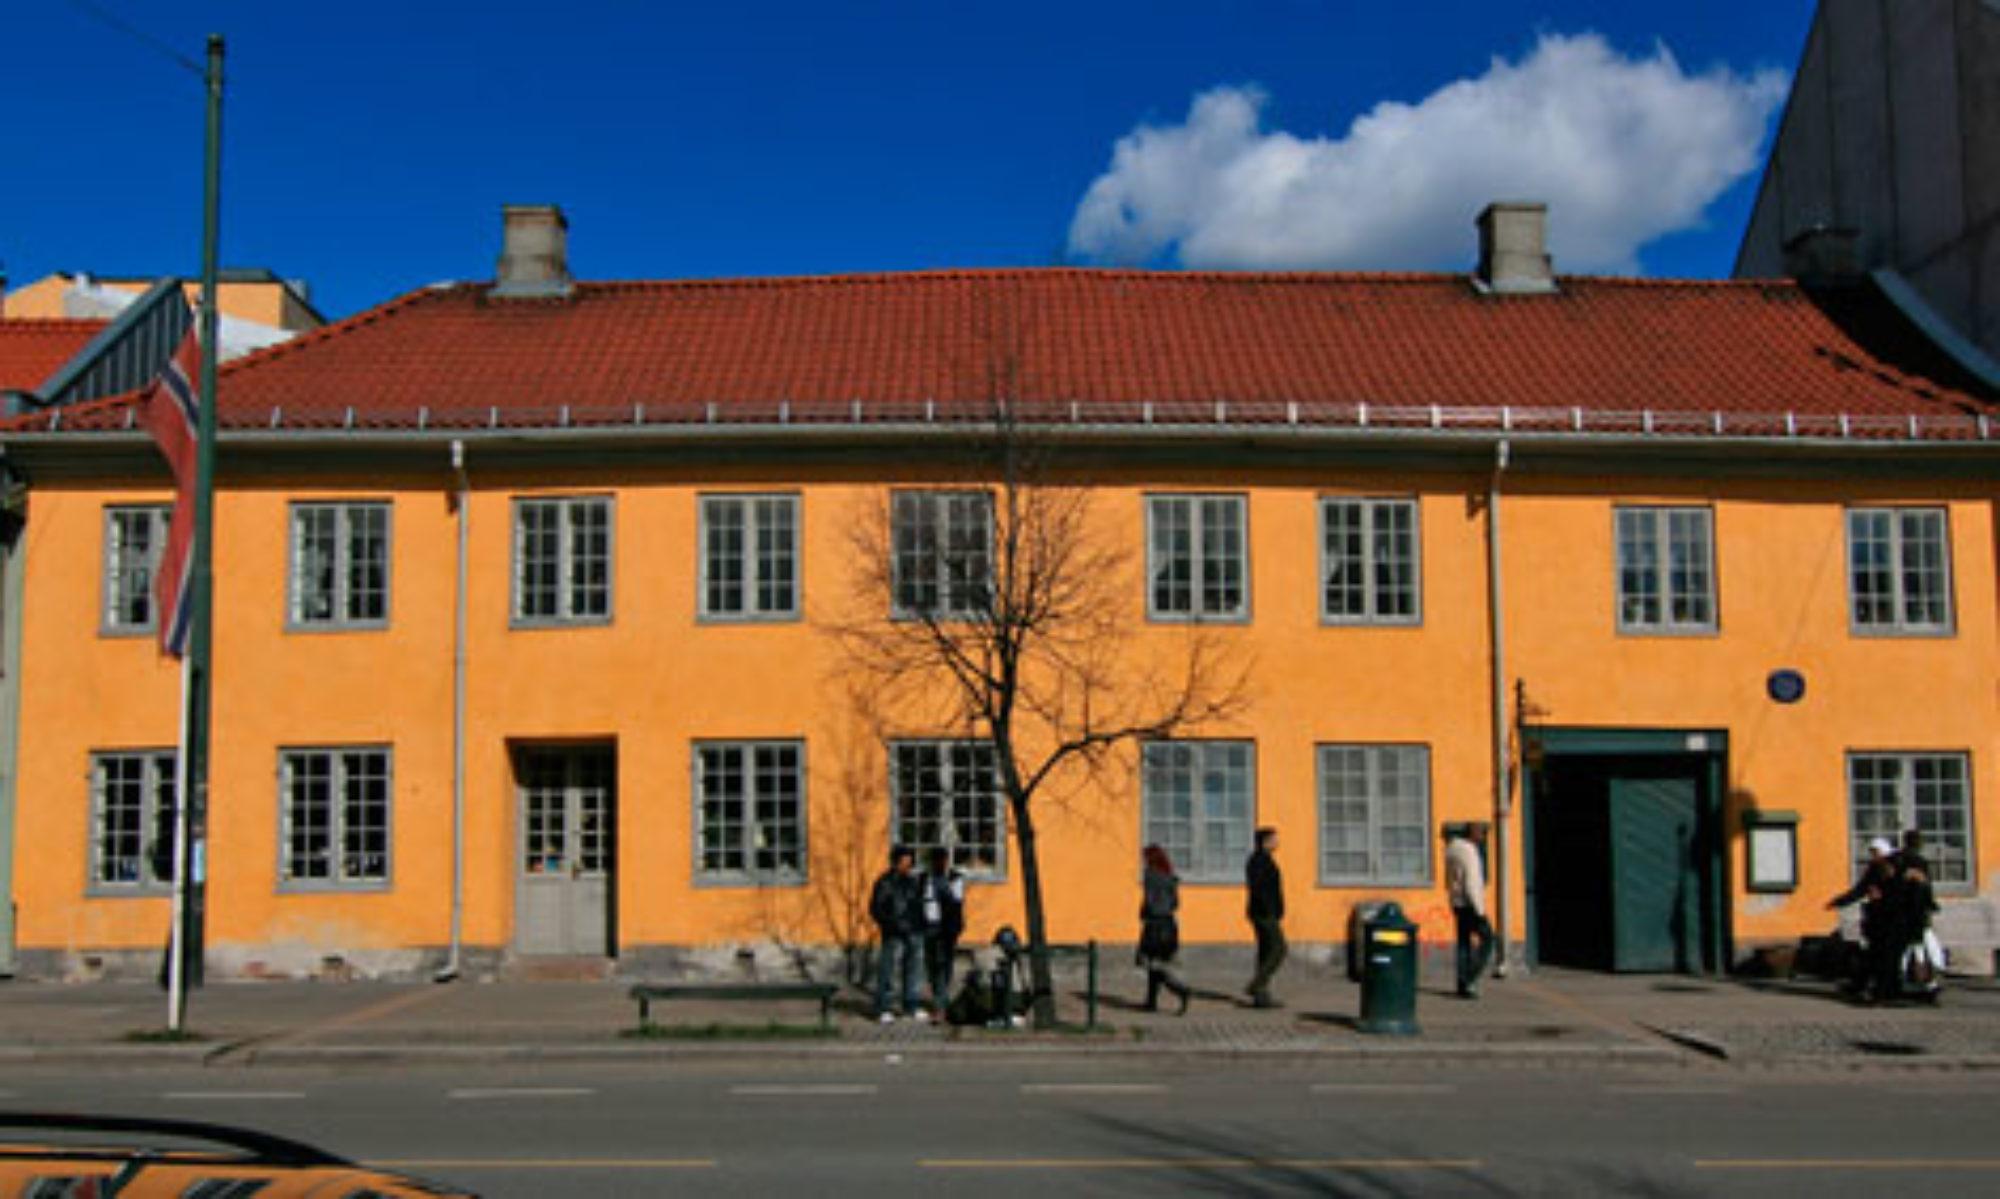 Grønland Beboerforening